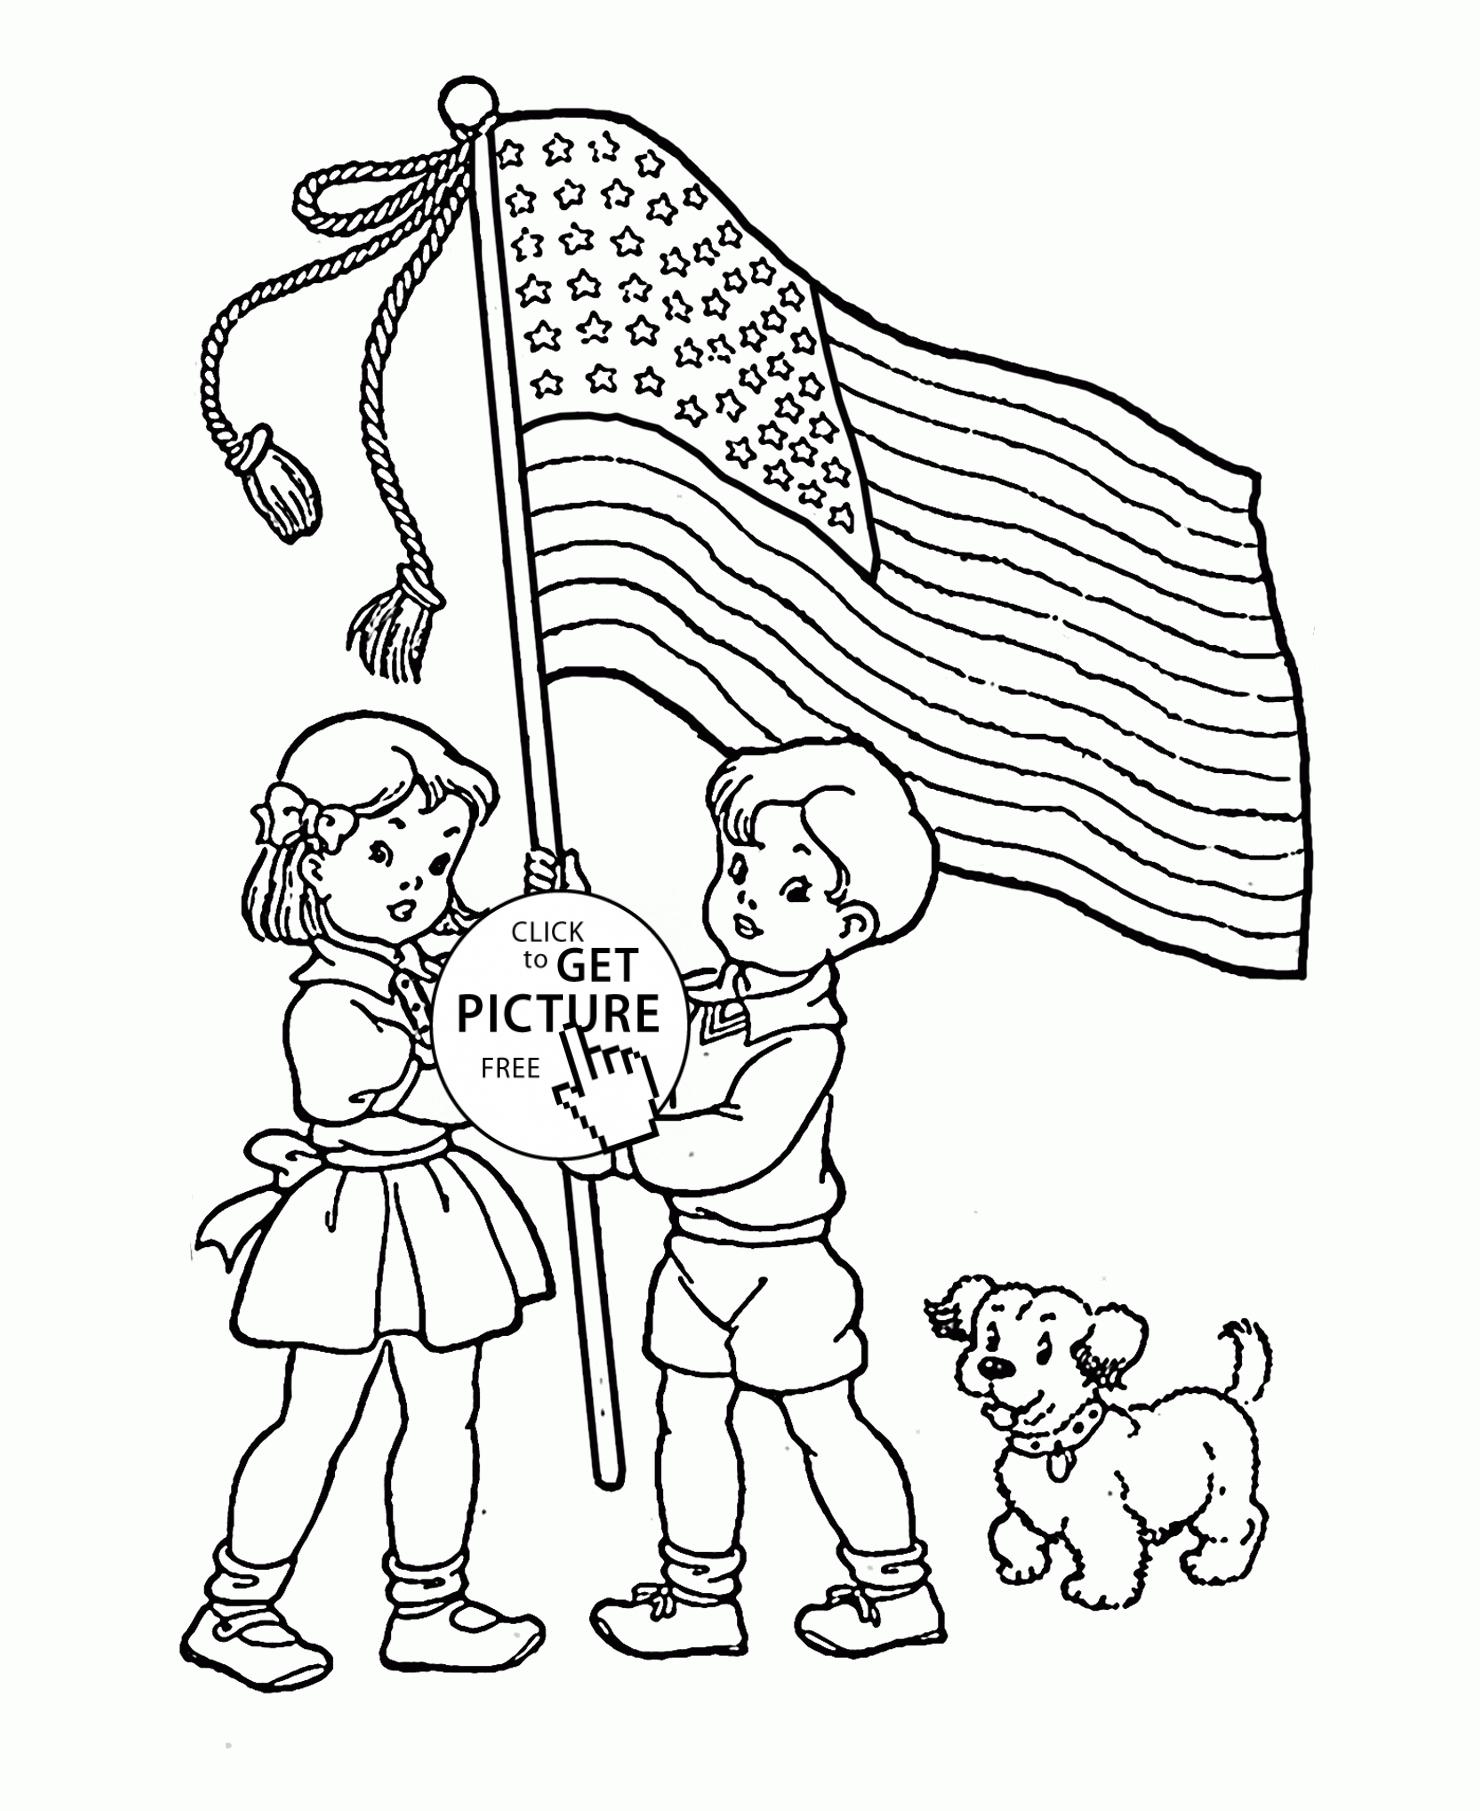 Patriotic Printable Coloring Pages At Getcolorings